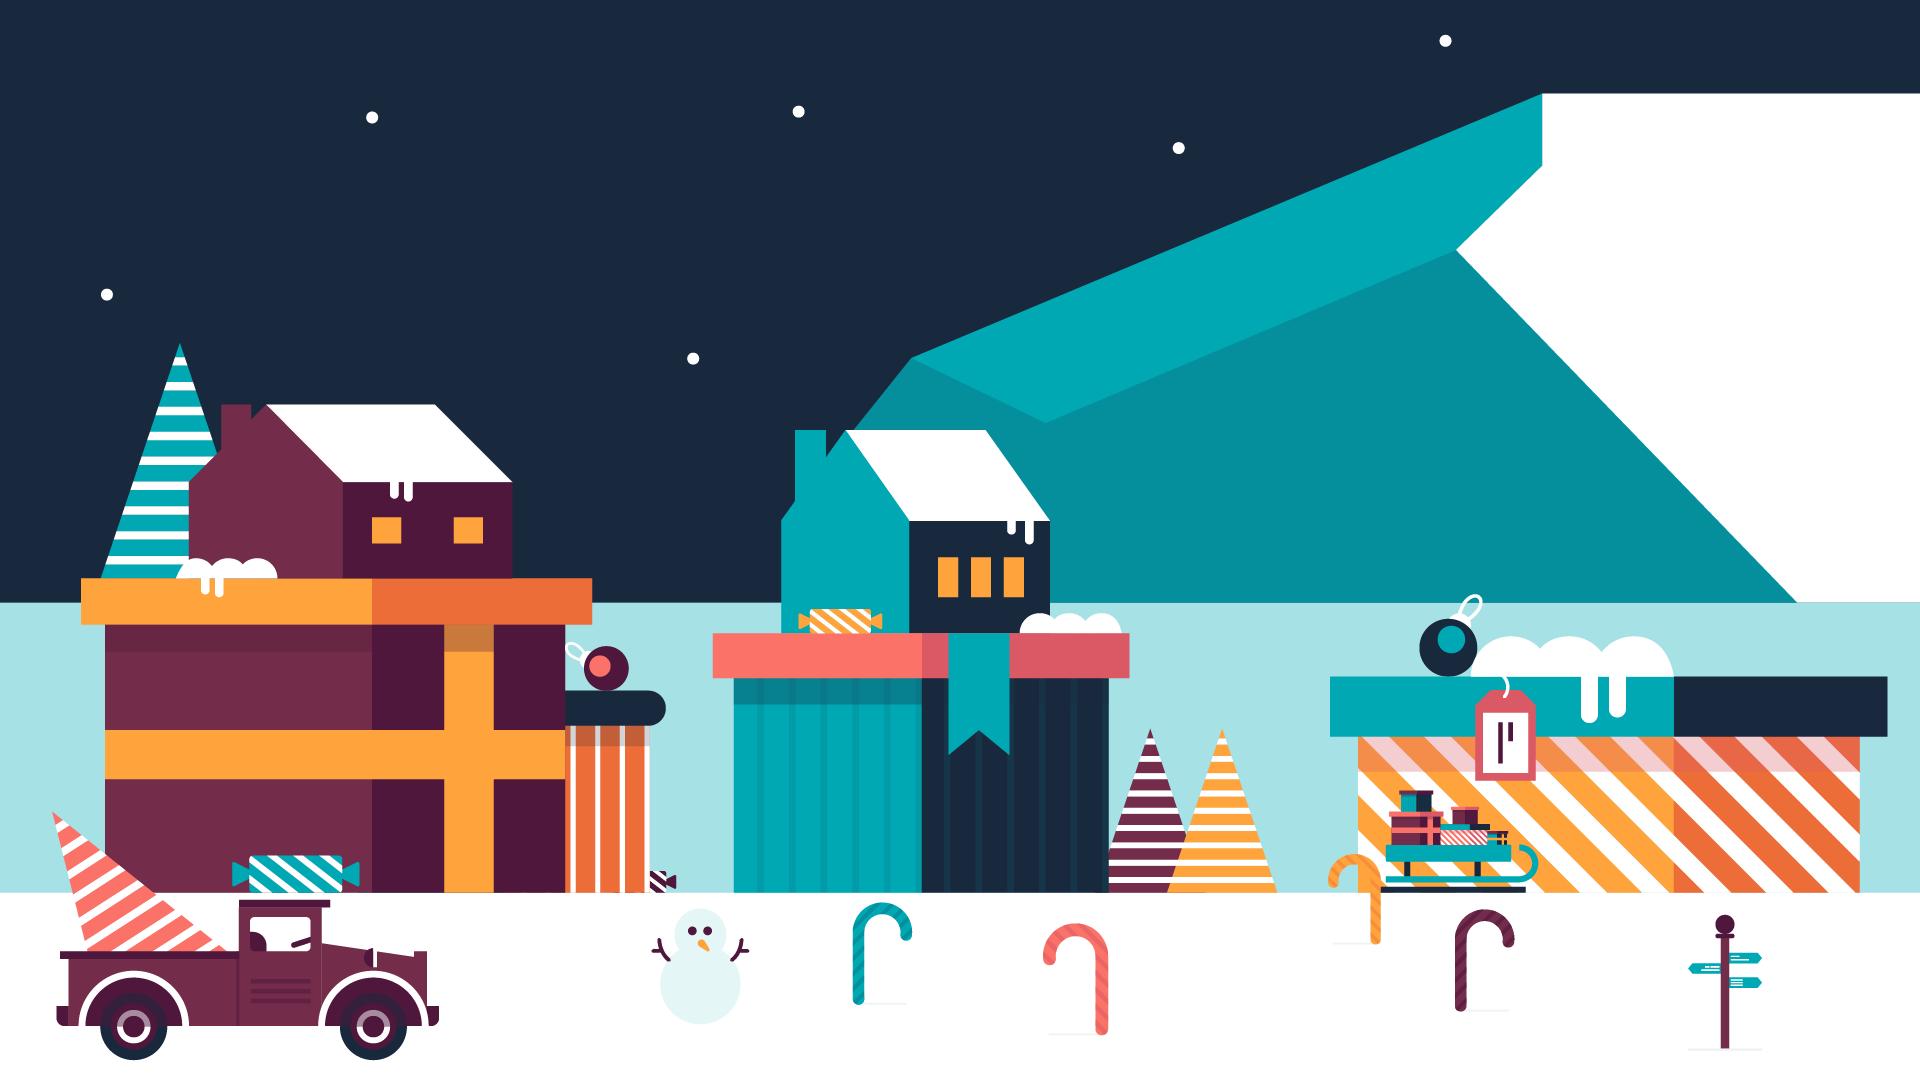 Christmas Snow Scenery Illustration